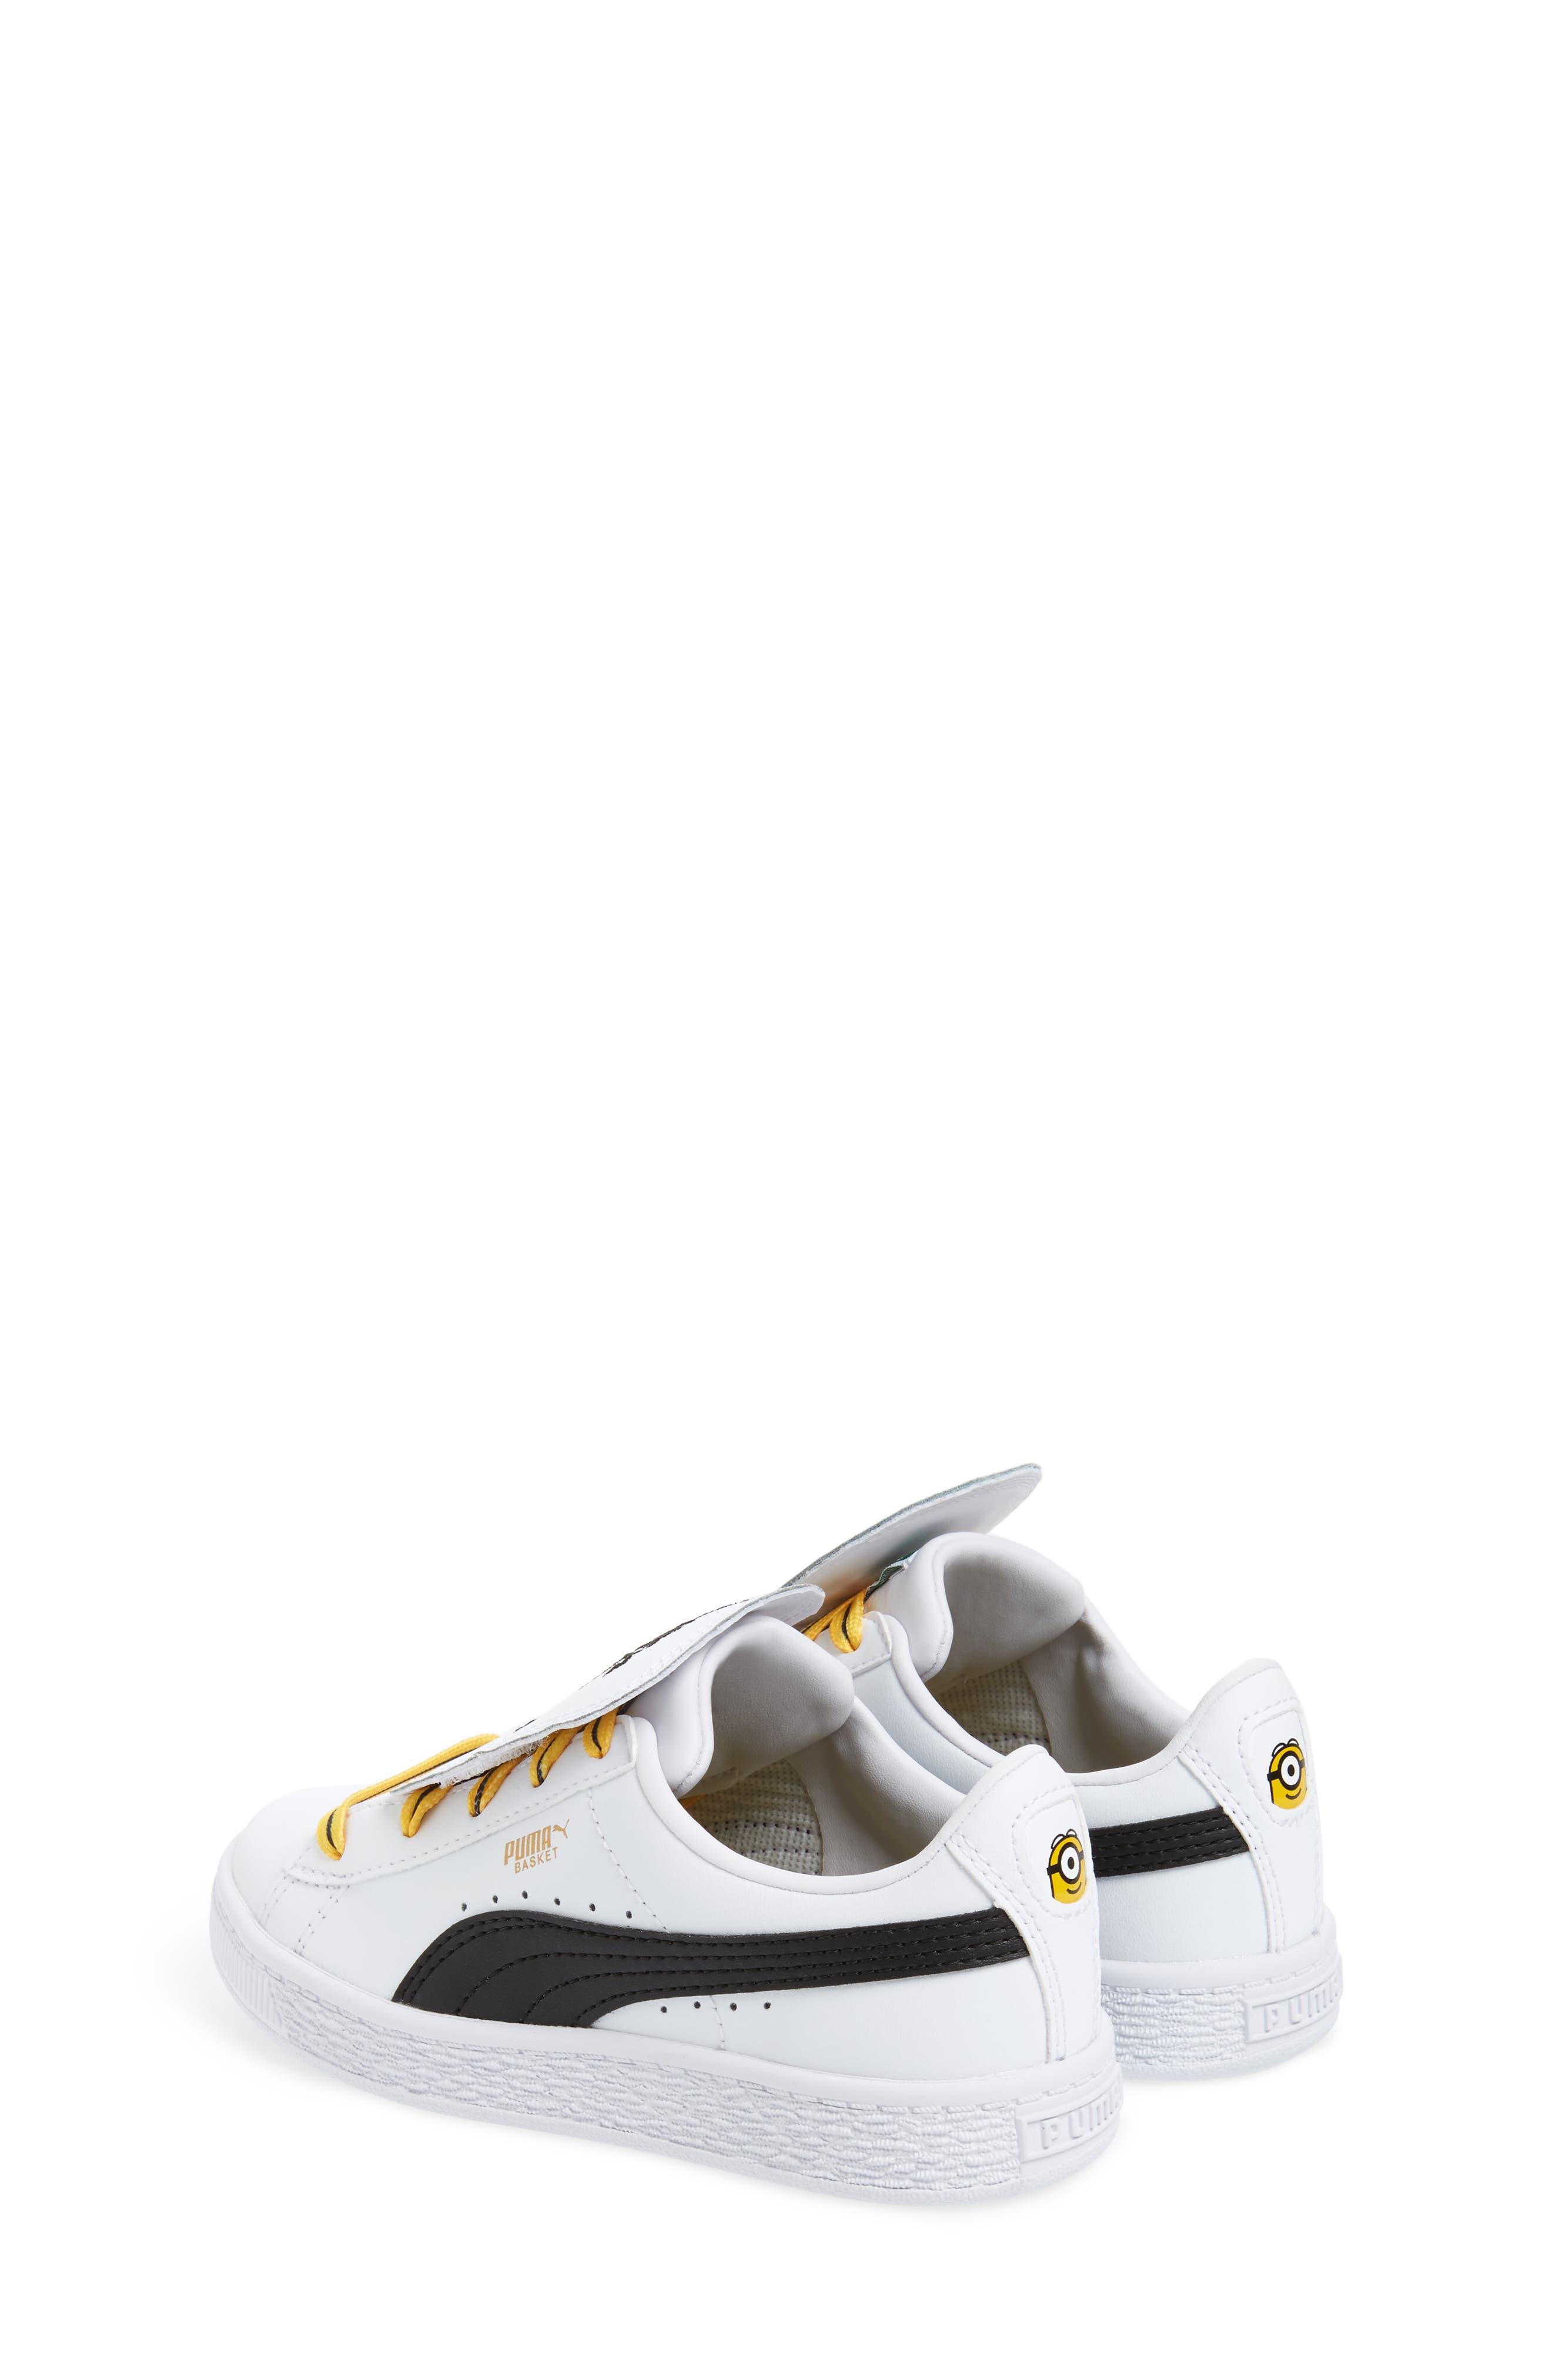 x Minions Basket Embroidered Tongue Sneaker,                             Alternate thumbnail 2, color,                             White/ Black/ Minion Yellow